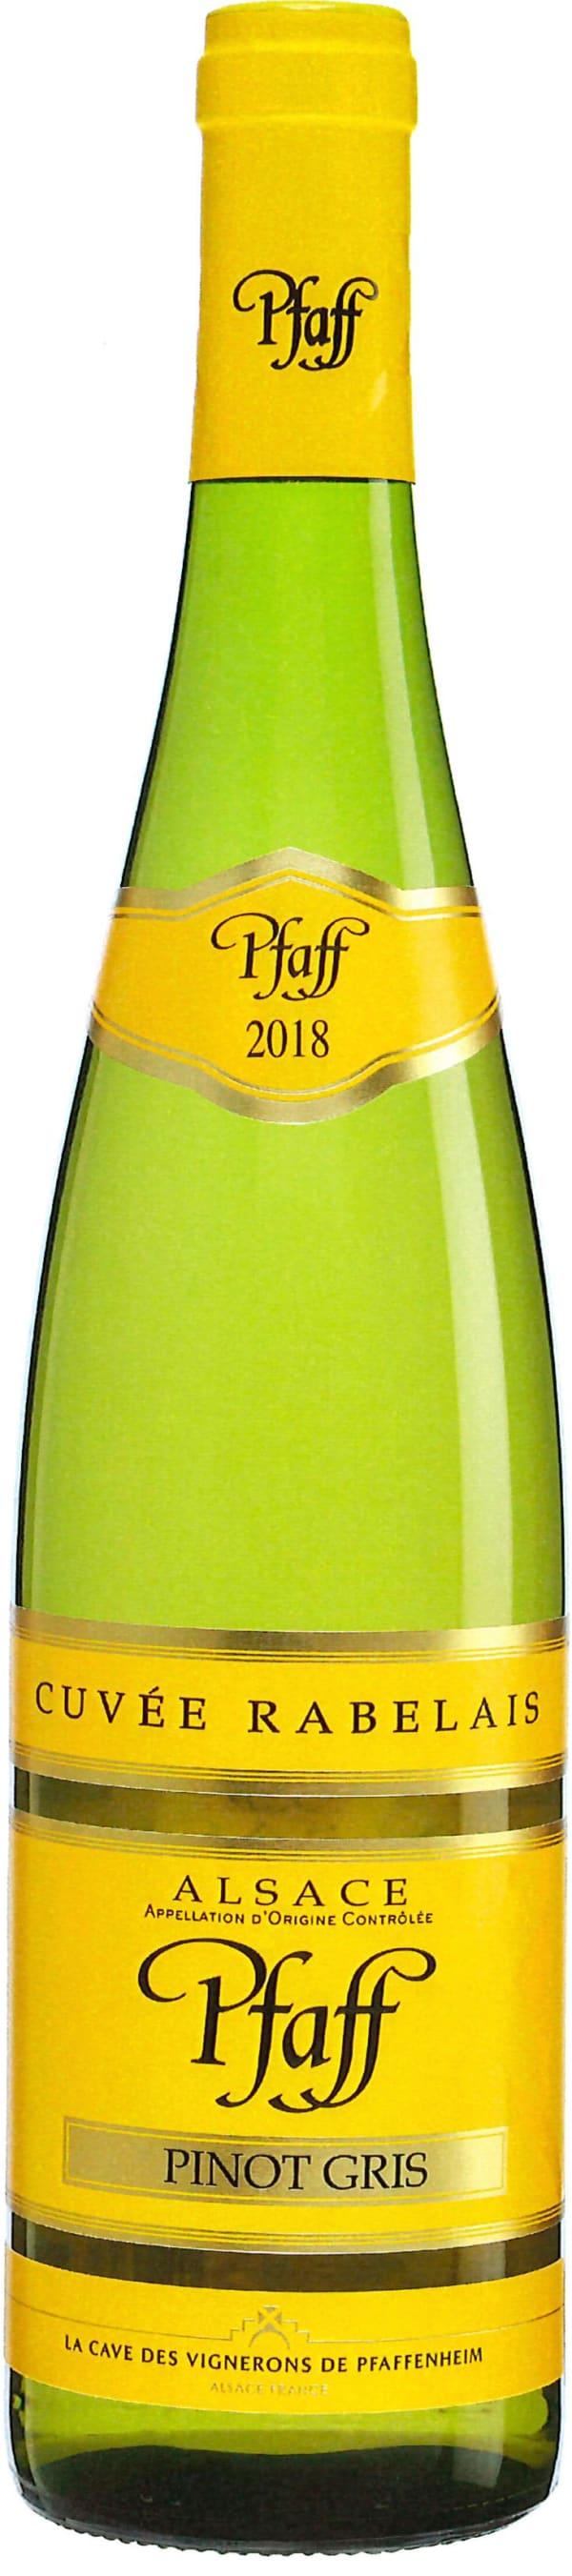 Pfaff Pinot Gris Cuvee Rabelais 2018